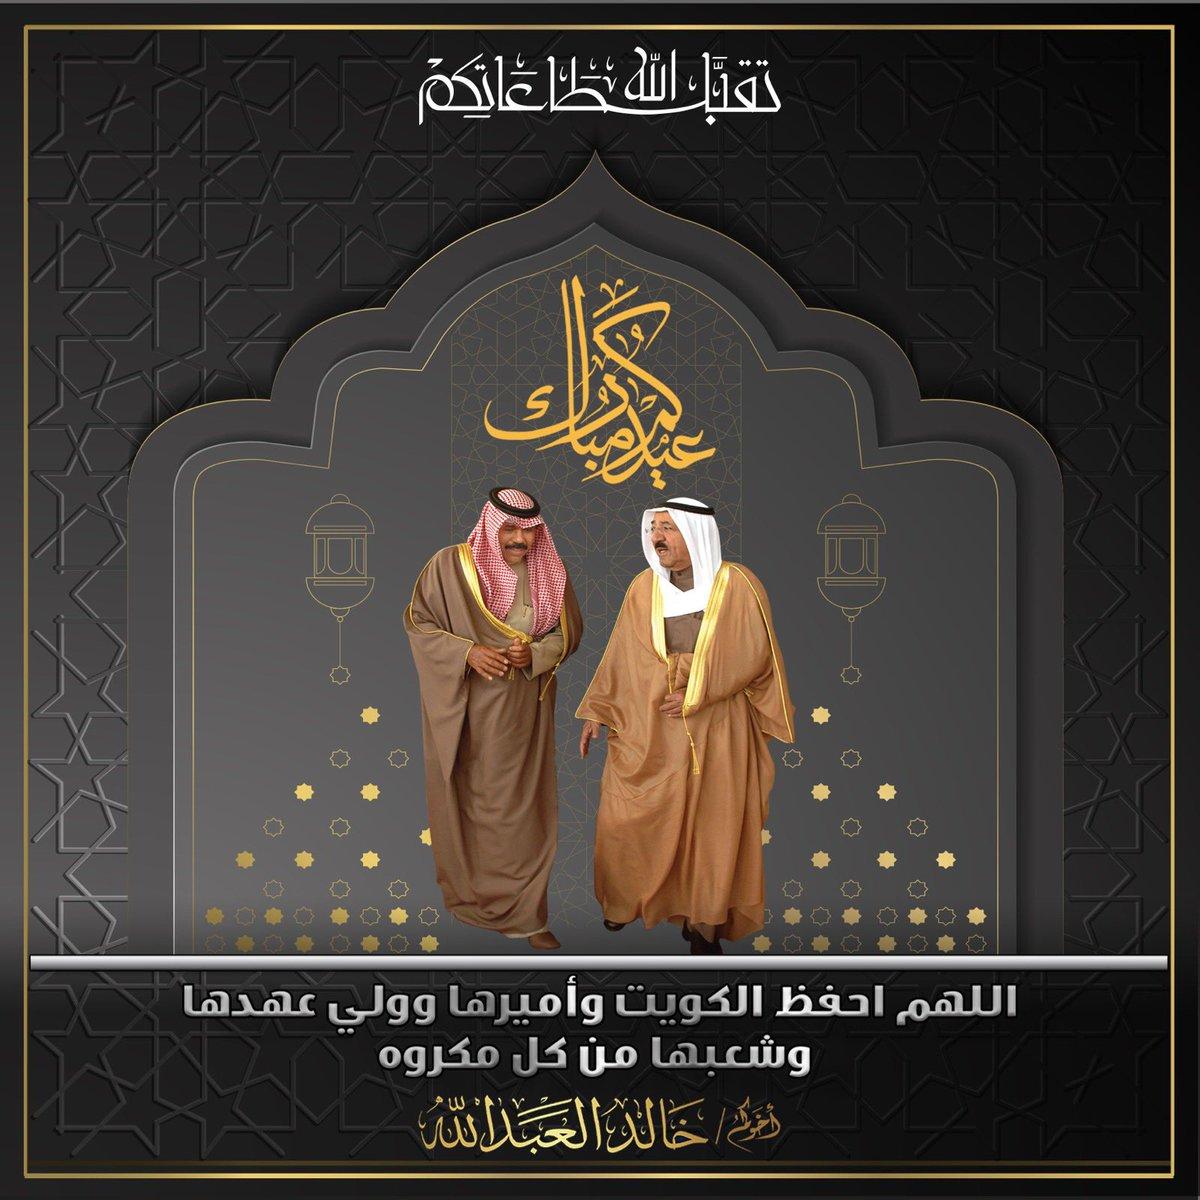 اخواني واخواتي الكرام عيدكم مبارك وكل عام وانتم بخير https://t.co/O1D1pwXm0p